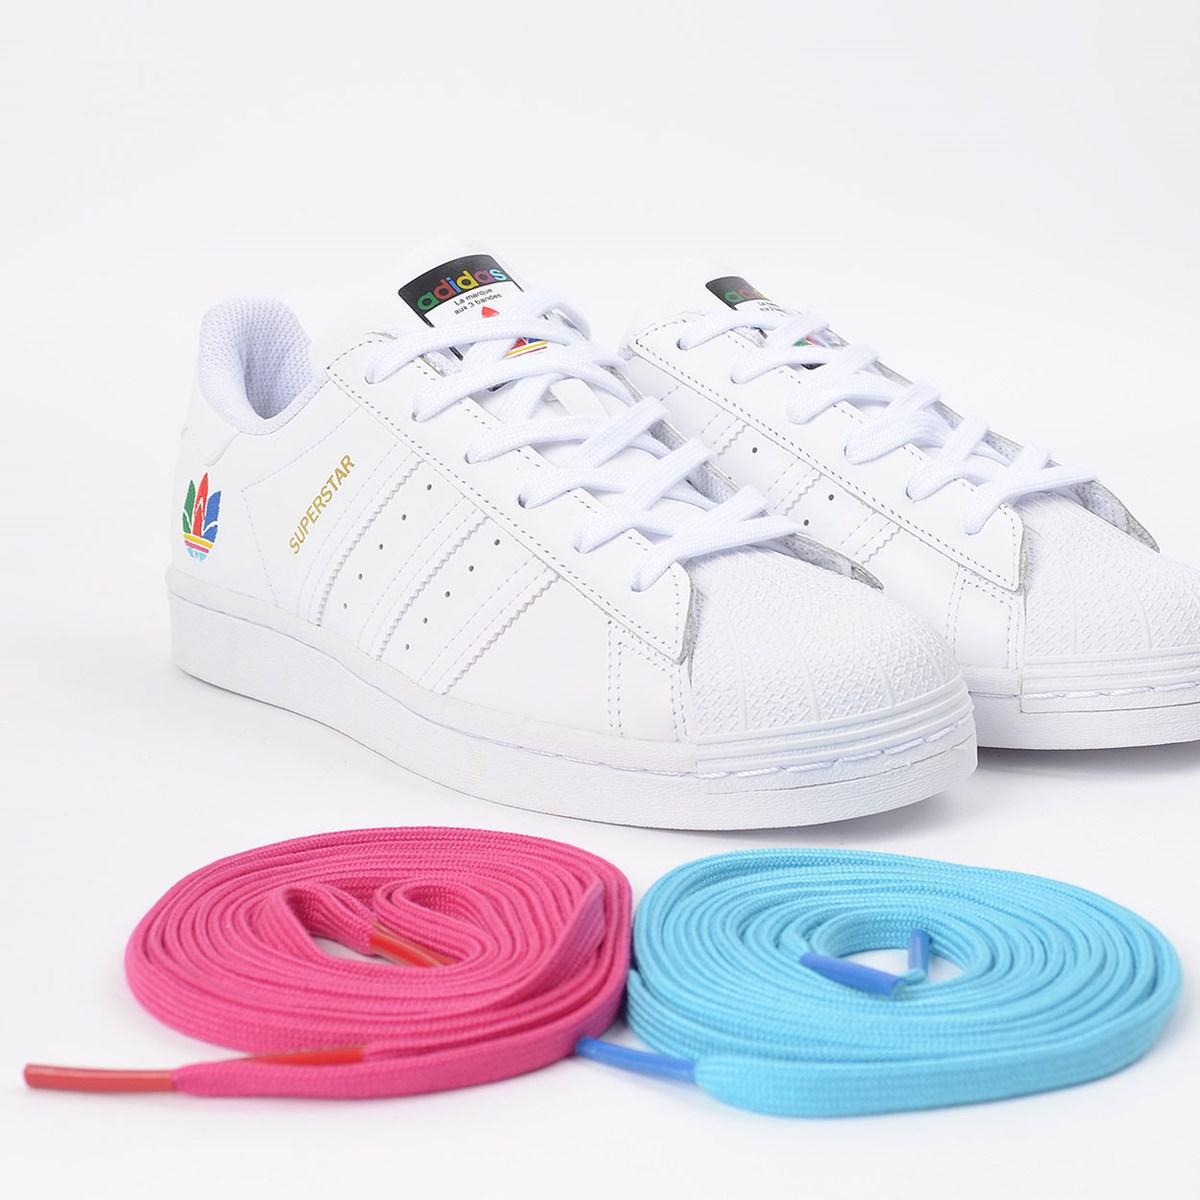 Tênis adidas Superstar Ftwr White Real Magenta FW3694